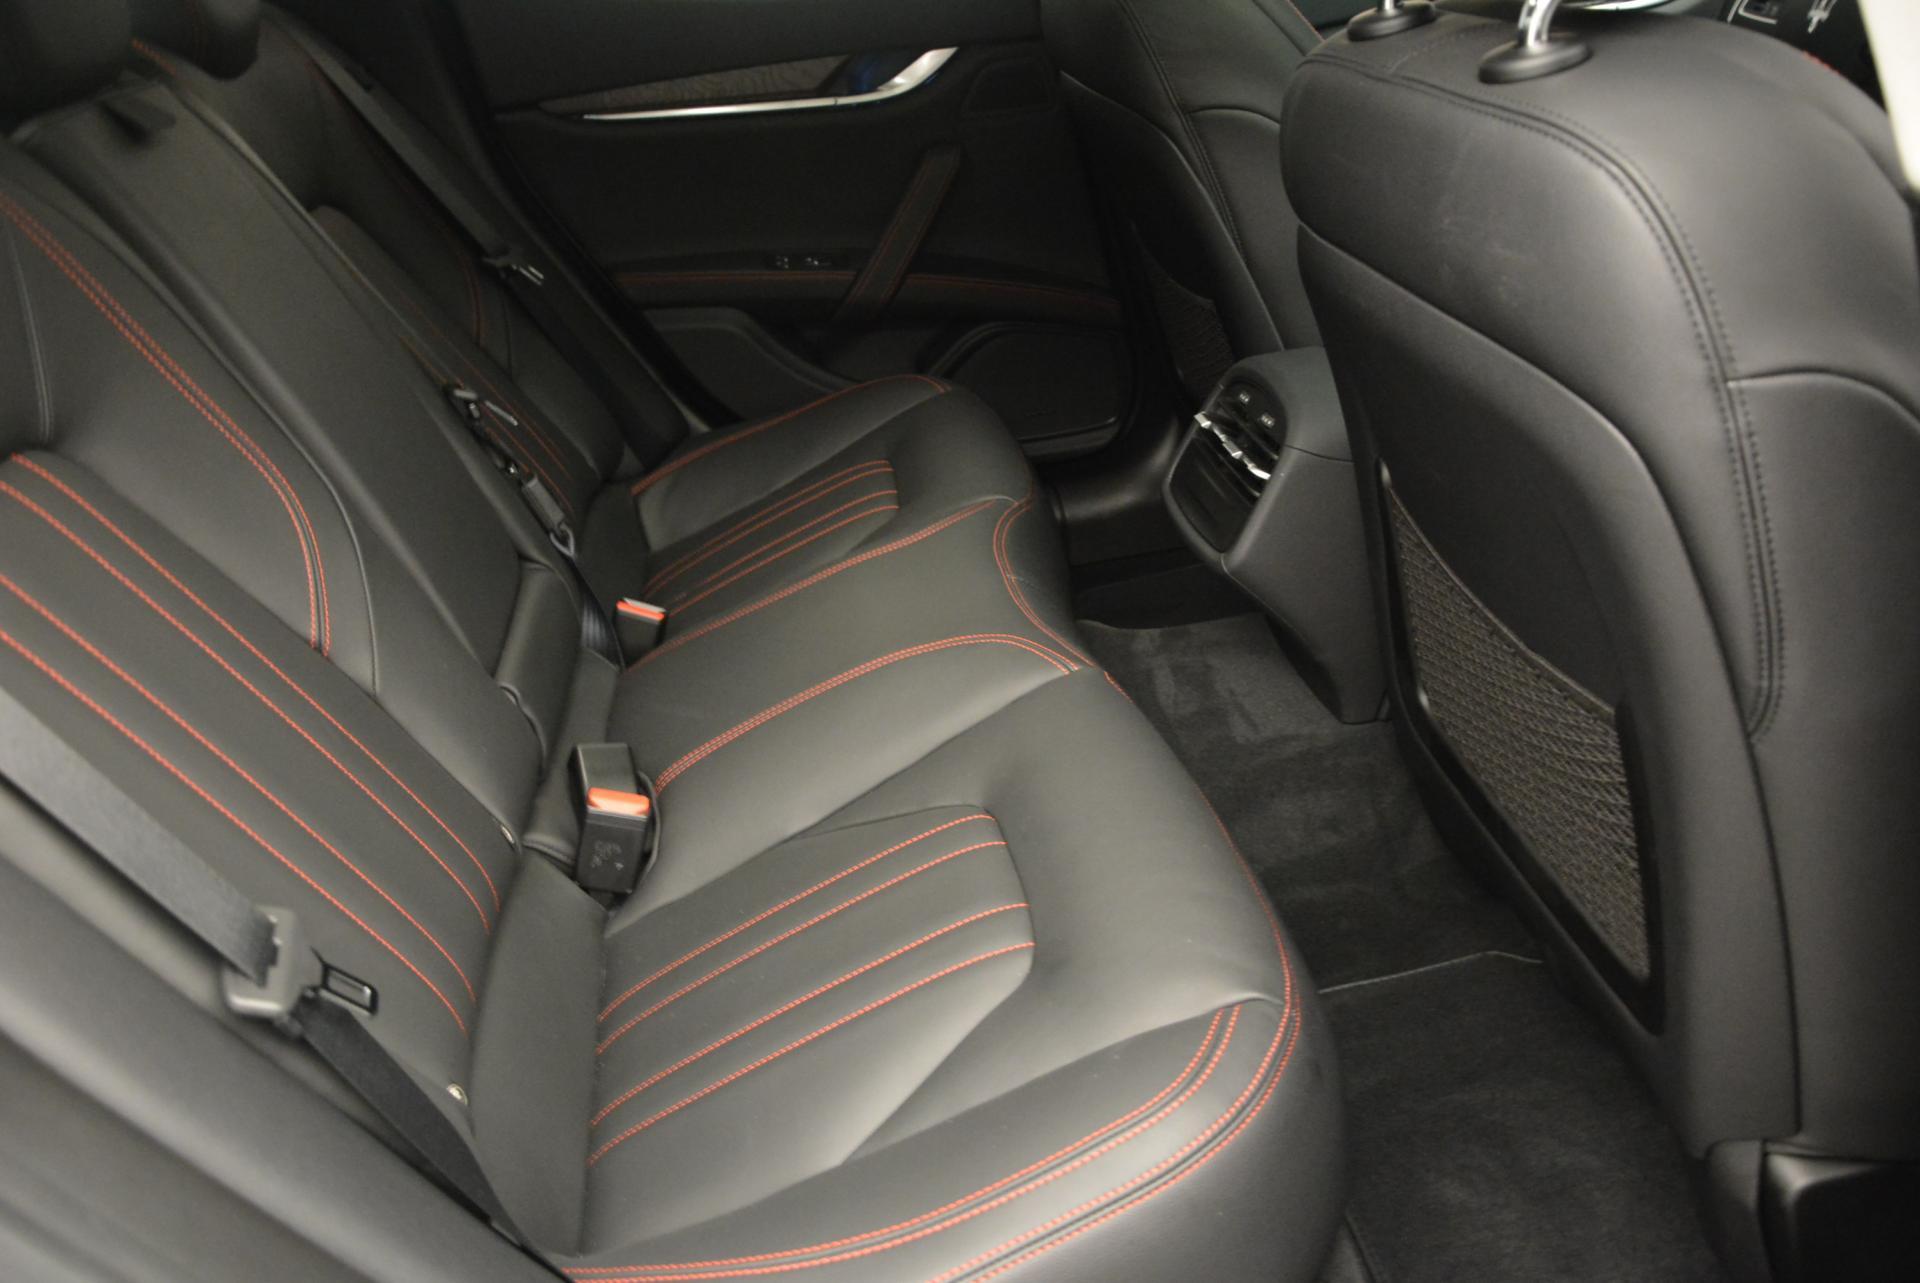 Used 2016 Maserati Ghibli S Q4 For Sale In Westport, CT 192_p18